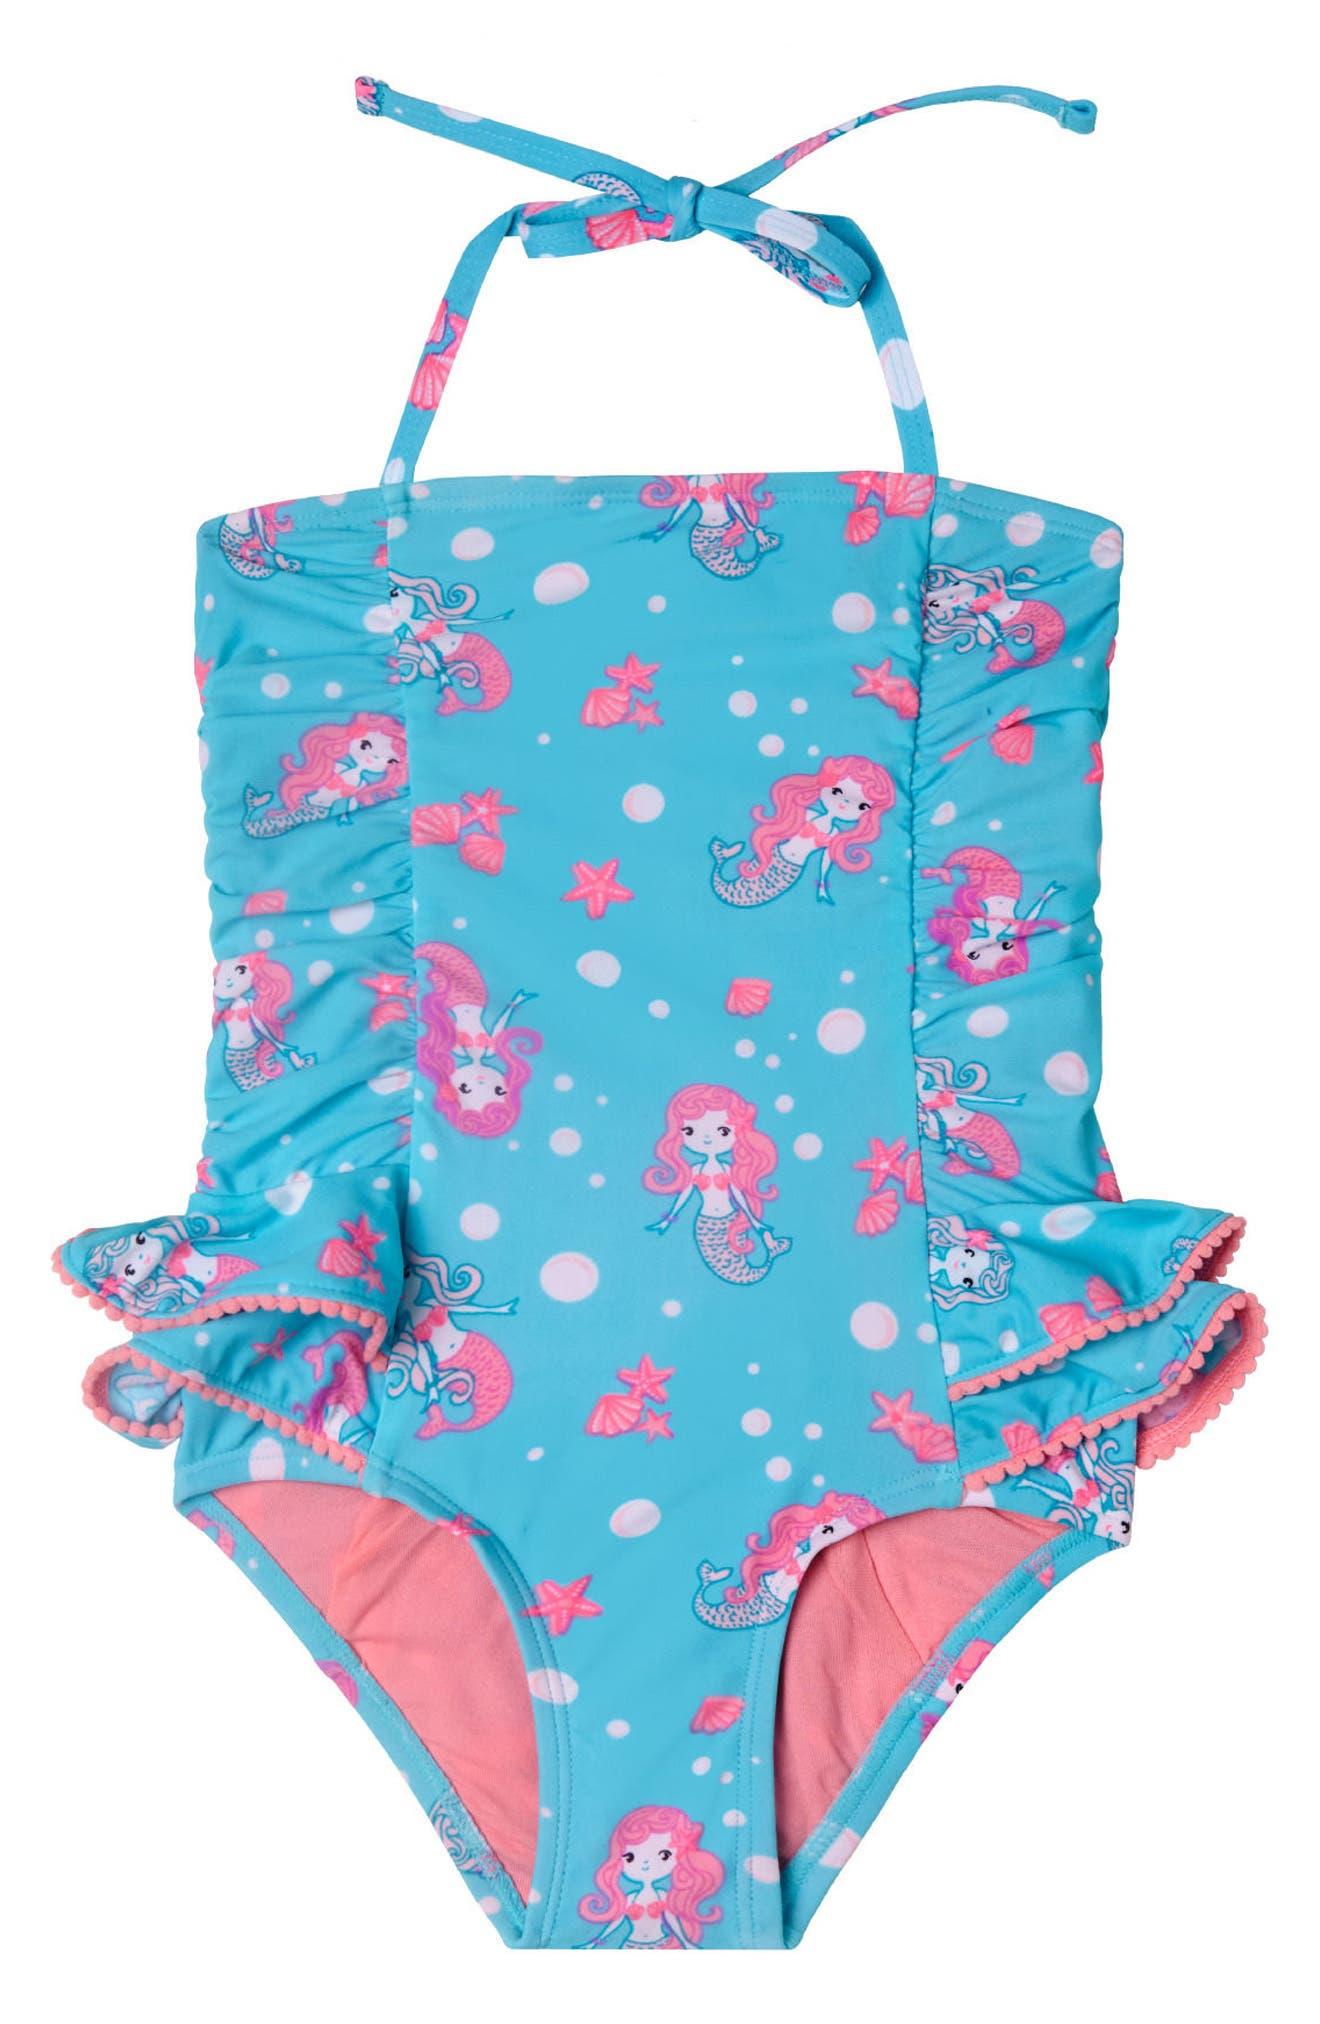 Mermaid Crush One-Piece Swimsuit,                         Main,                         color, 405